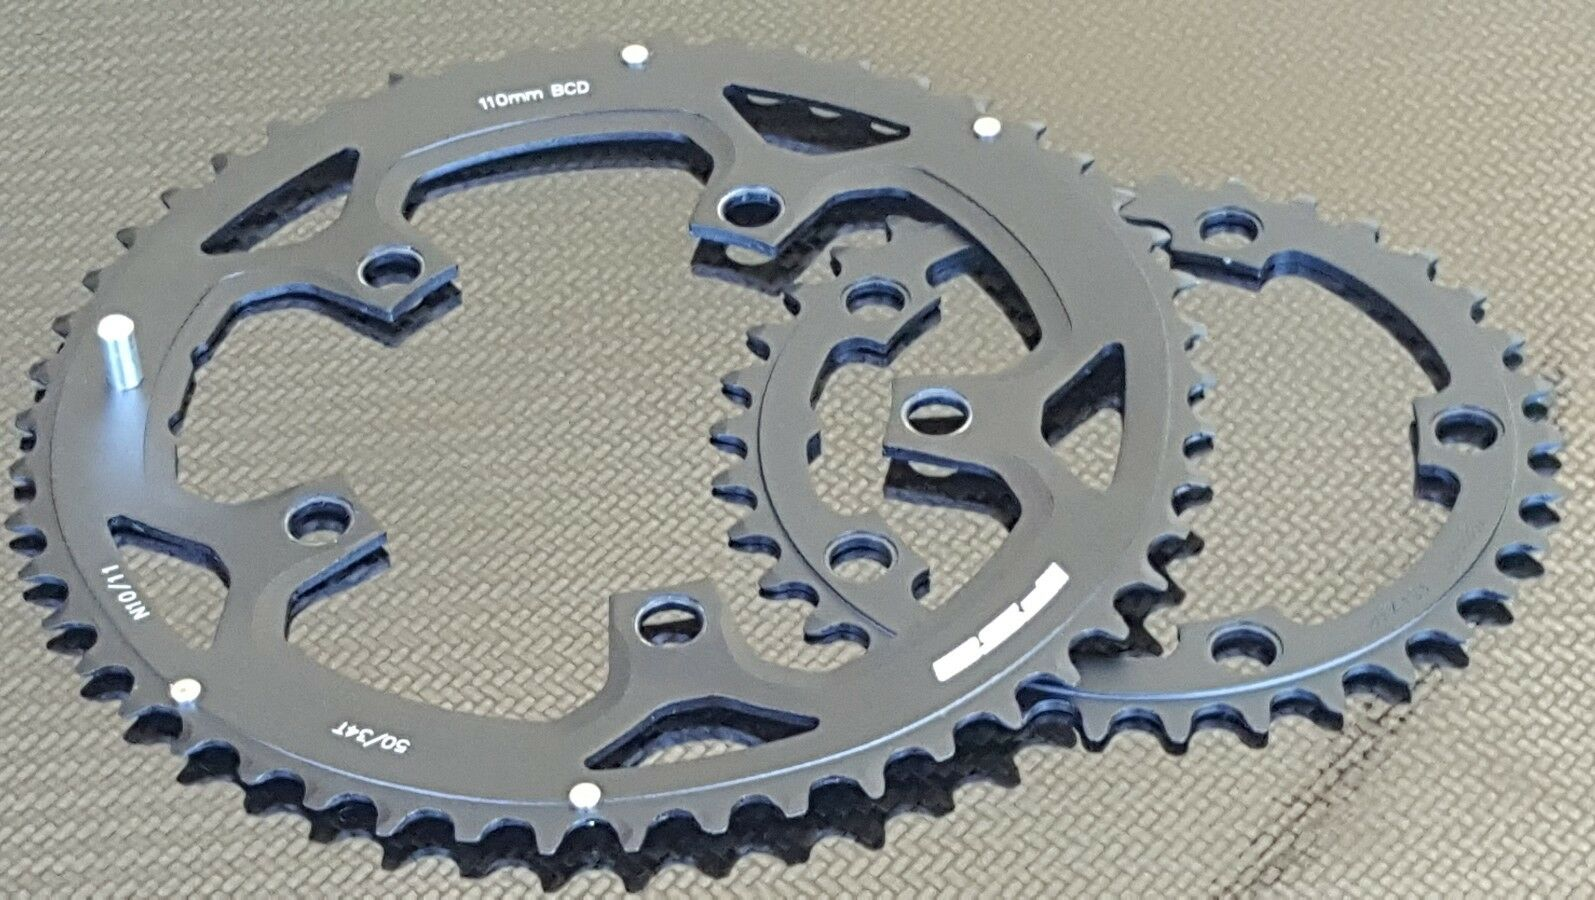 2x Pro Platos Fsa (34 + 50 T) 10 11s Compacto Anillos de Cadena de Bicicleta de carretera (nuevo)